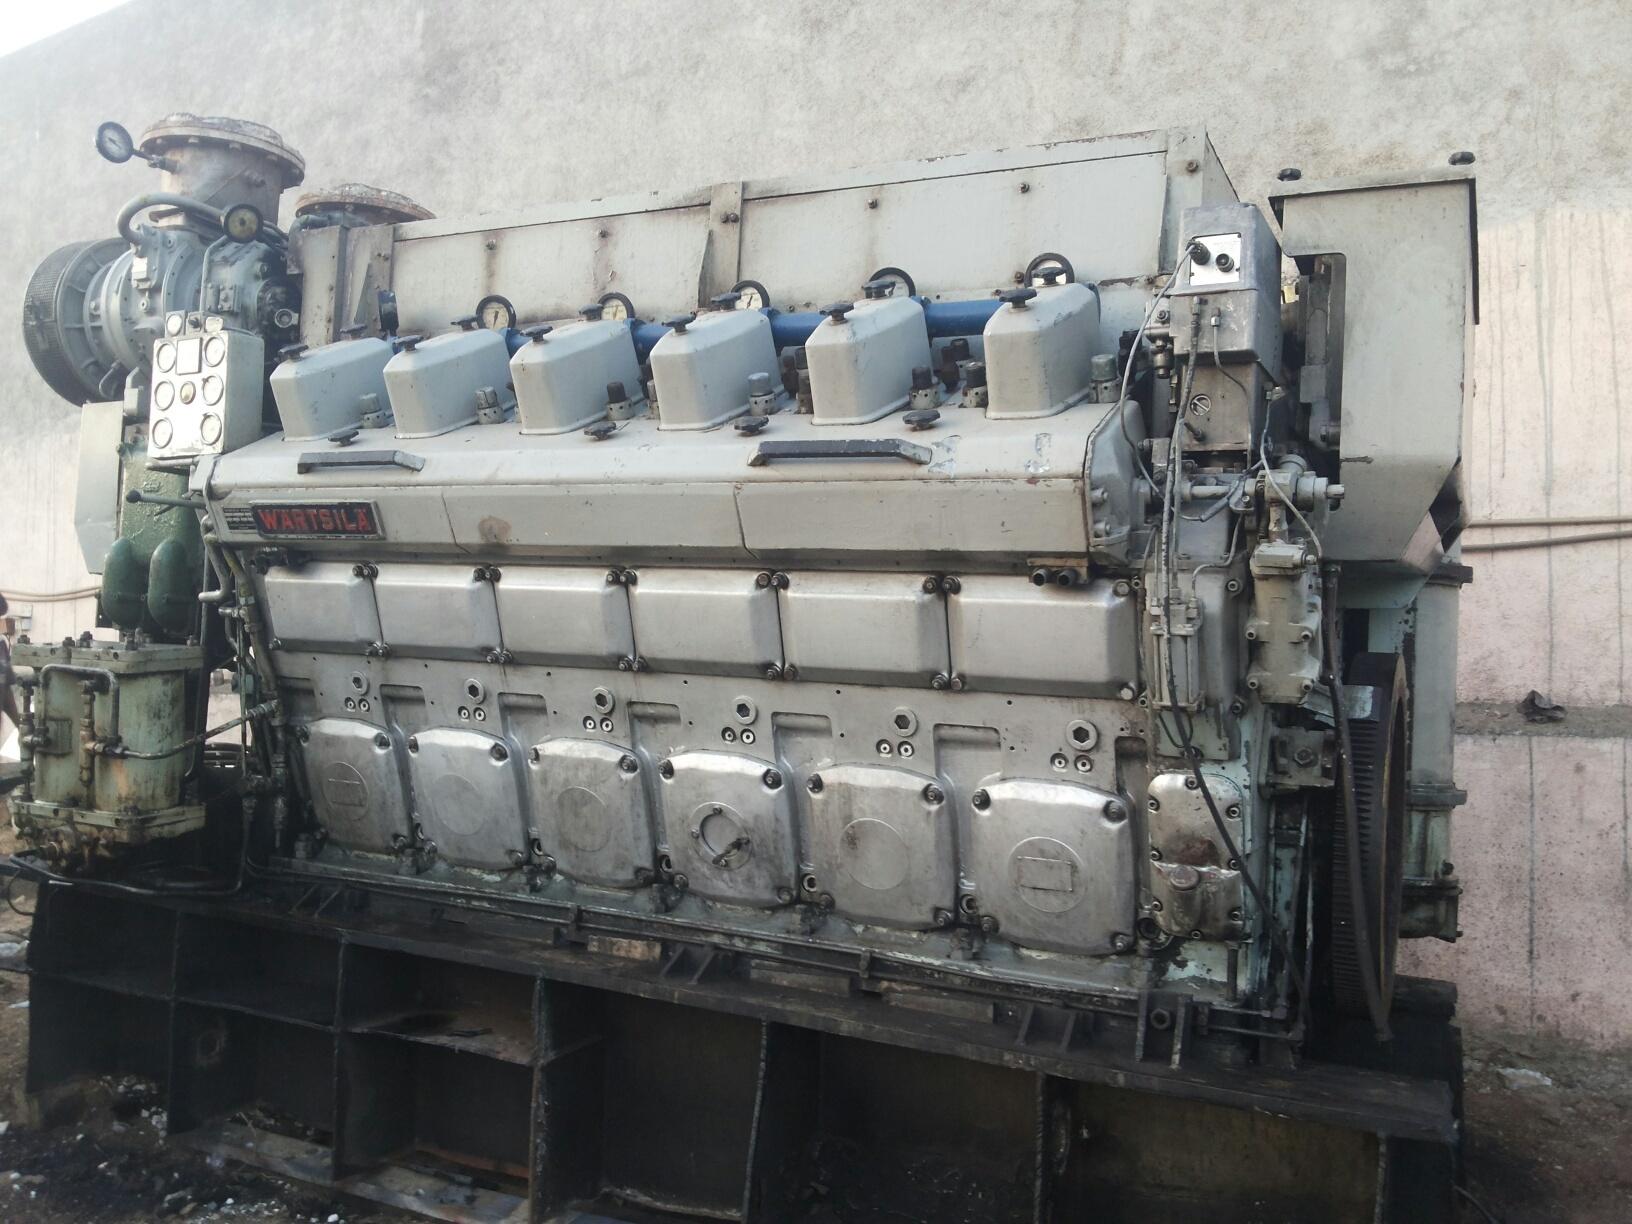 Wartsila 12V22HF Marine Engine